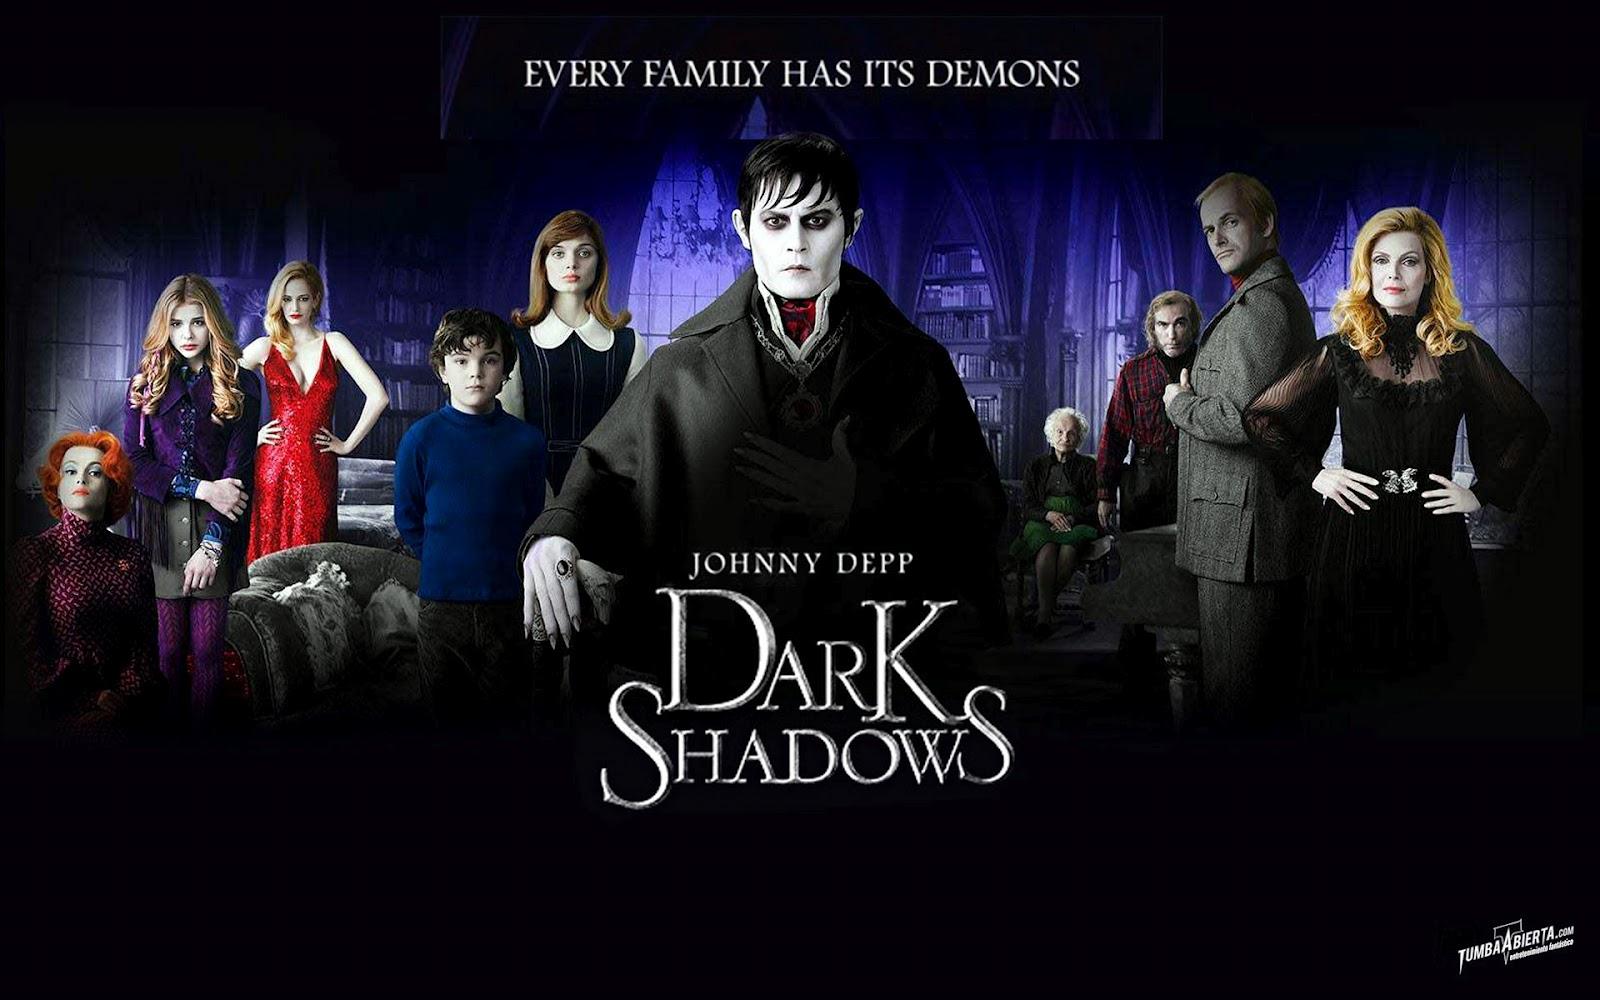 http://3.bp.blogspot.com/-LQbyFuswe30/T2OLtlQfJcI/AAAAAAAAASA/icLE5ujfkuk/s1600/wallpaper_hd_dark_shadows-1920x1200_tim-burton.jpg